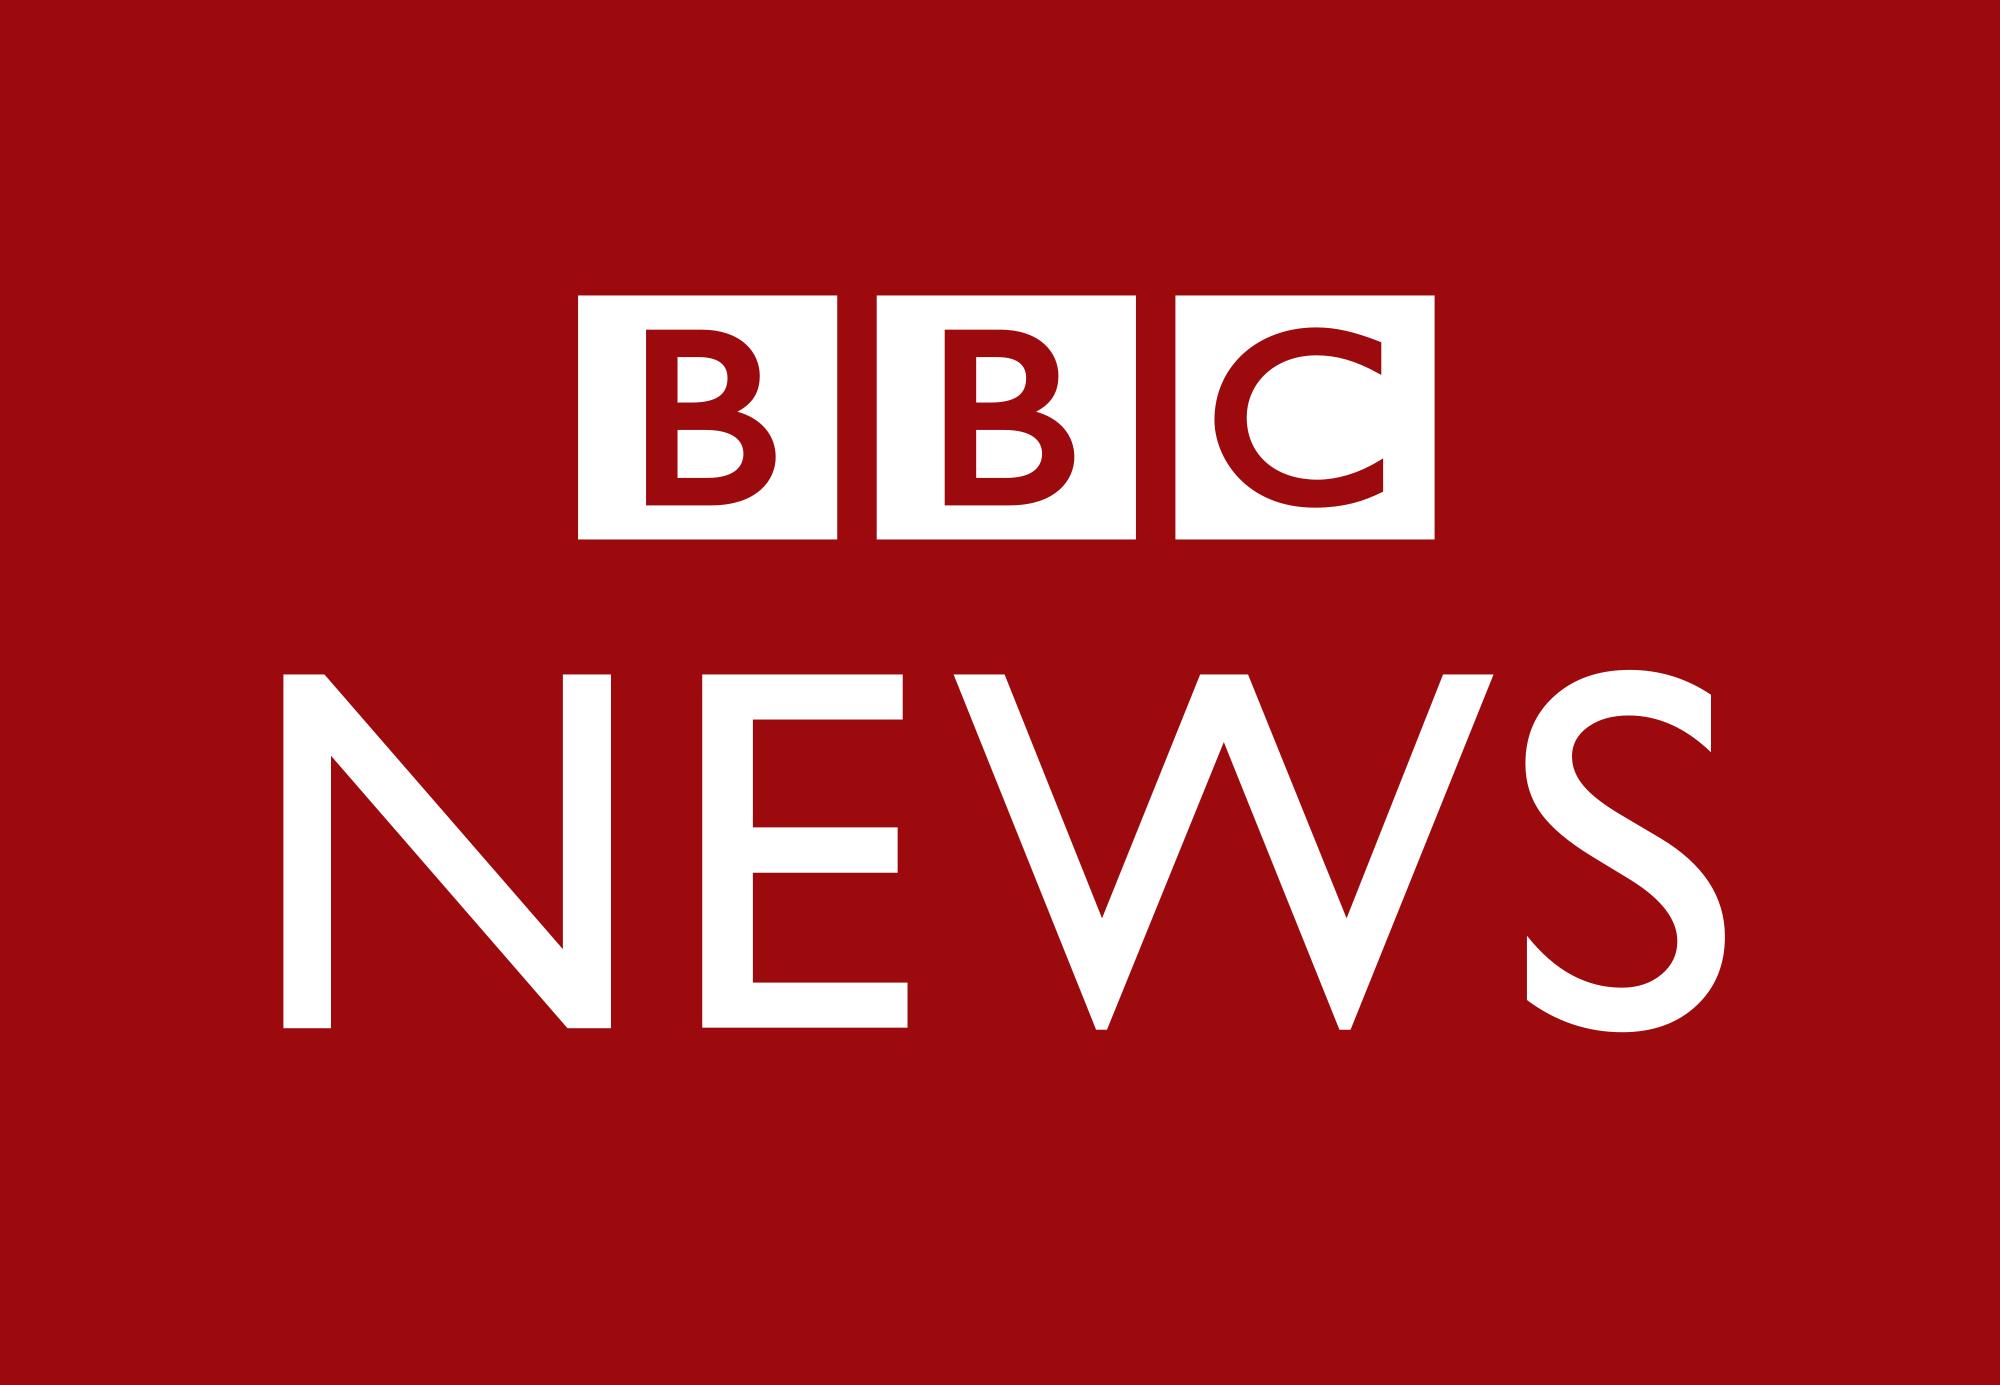 BBC_News_large_logo.png